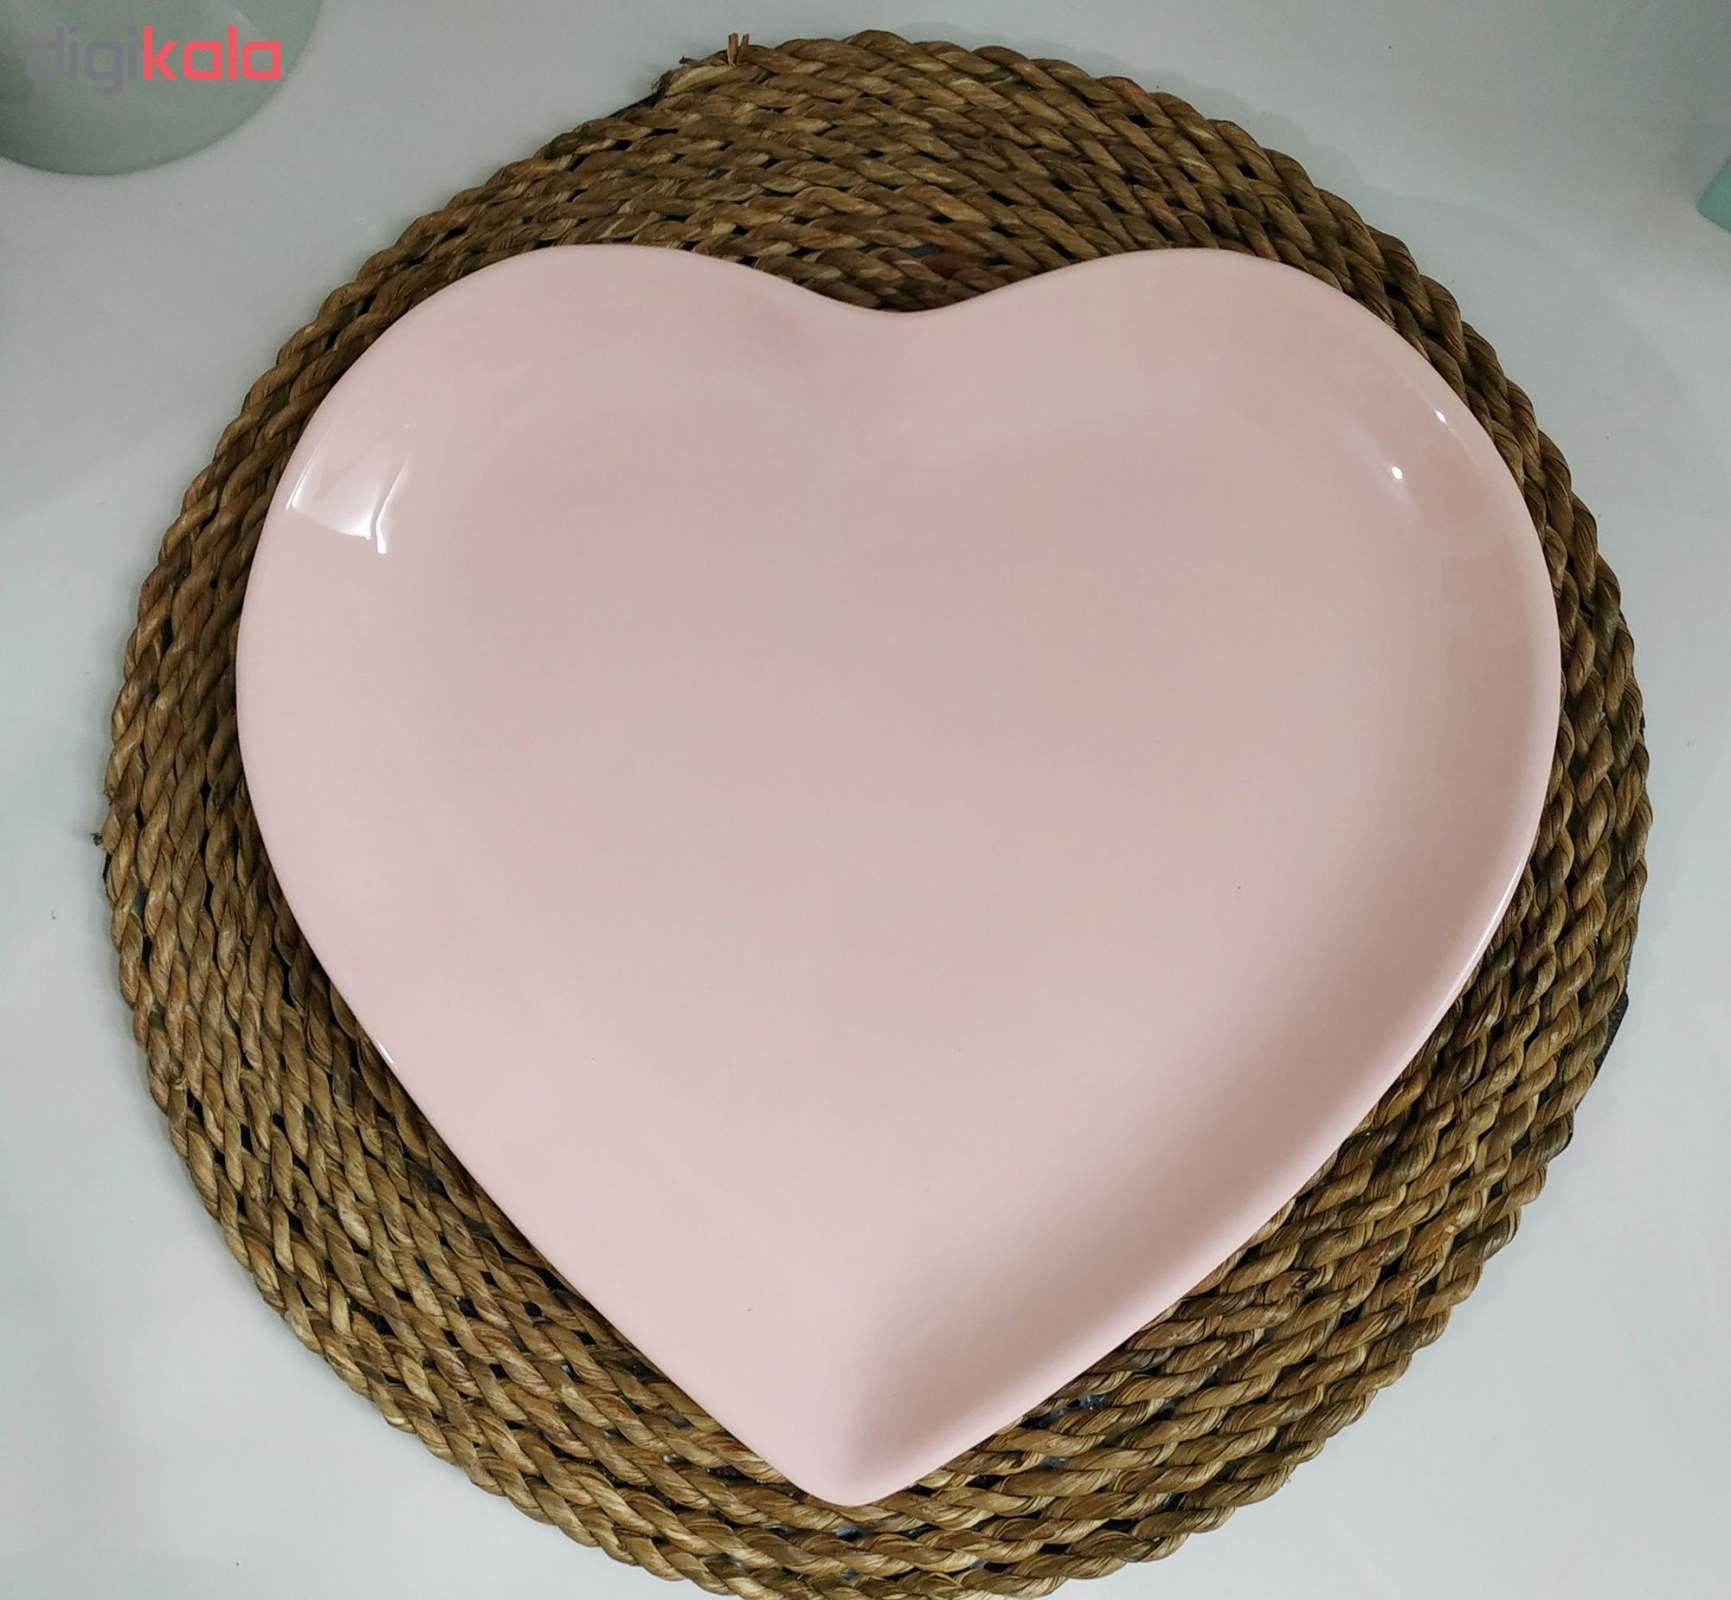 بشقاب غذاخوری طرح قلب کد093 بسته 2 عددی thumb 3